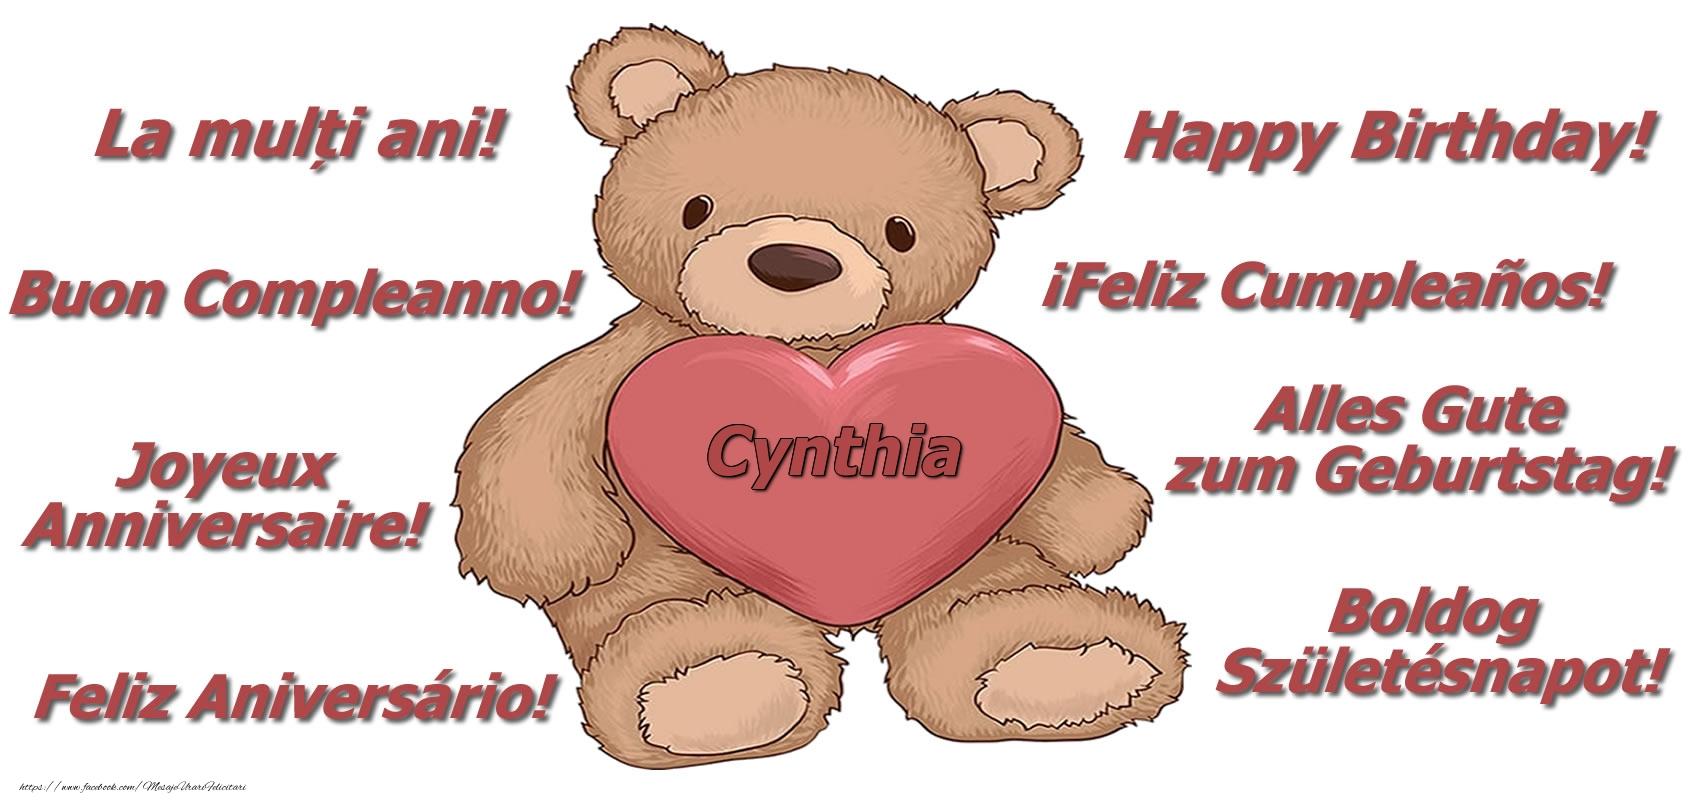 Felicitari de zi de nastere - La multi ani Cynthia! - Ursulet